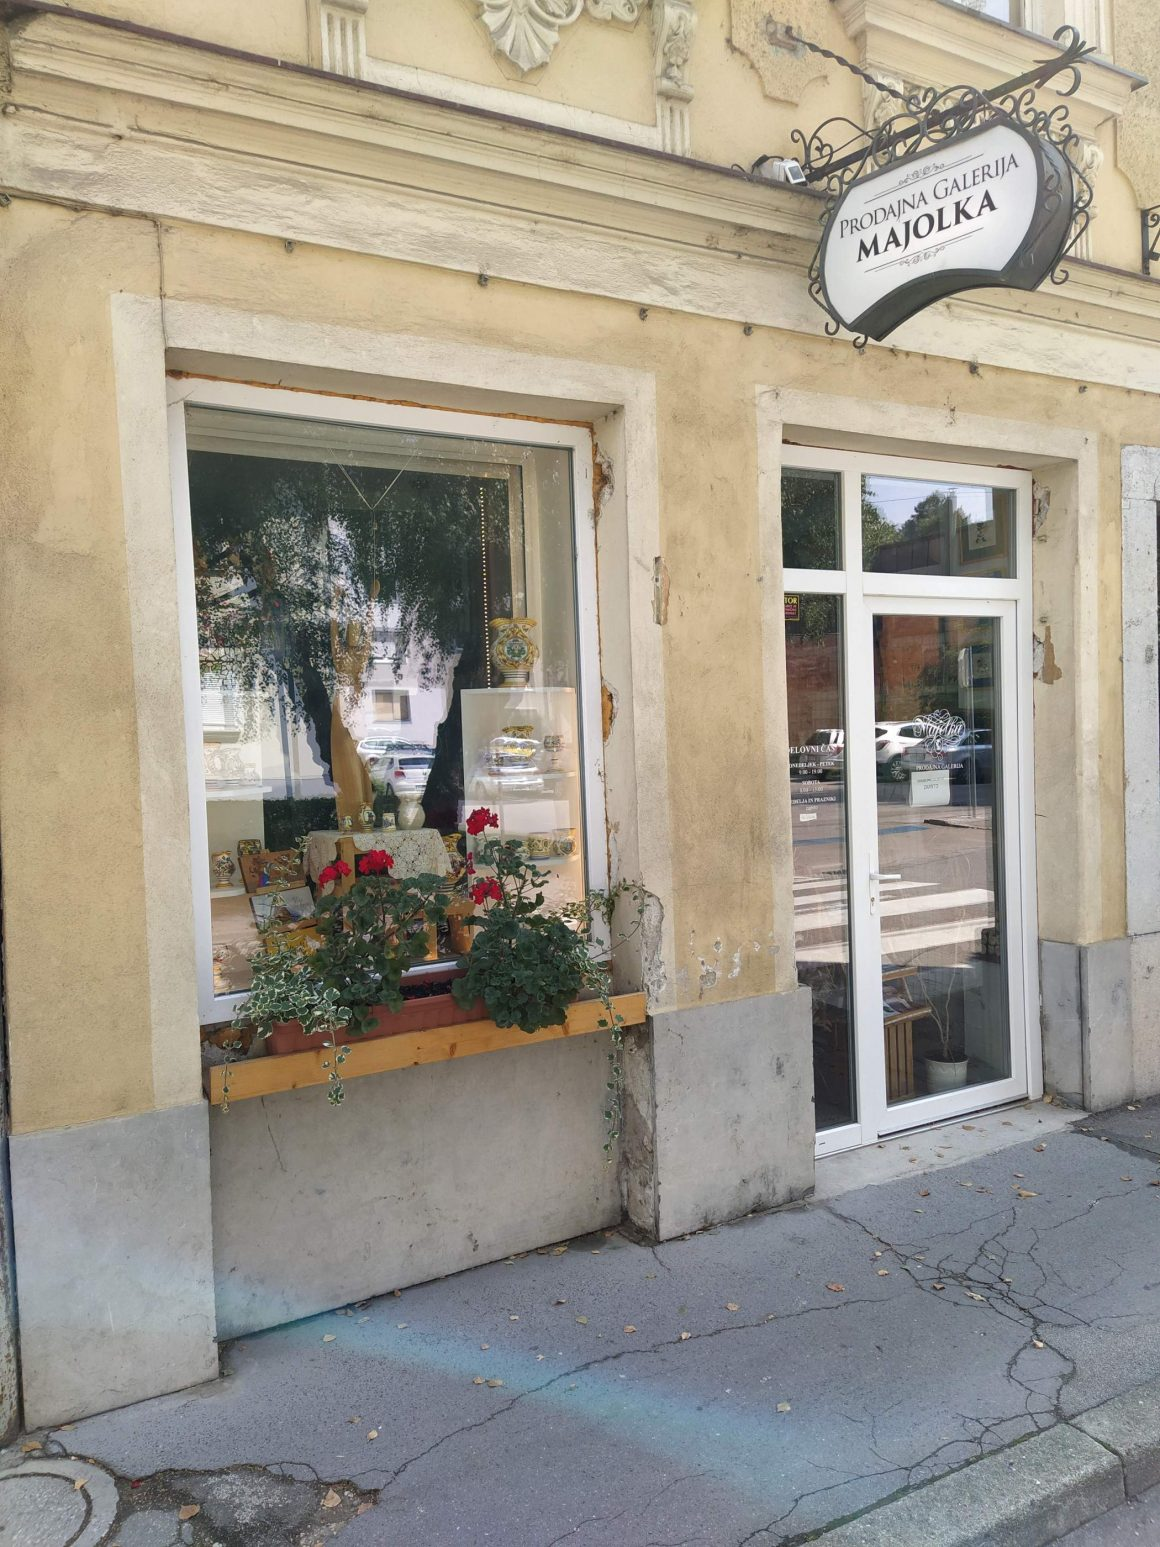 Galerija Majolka